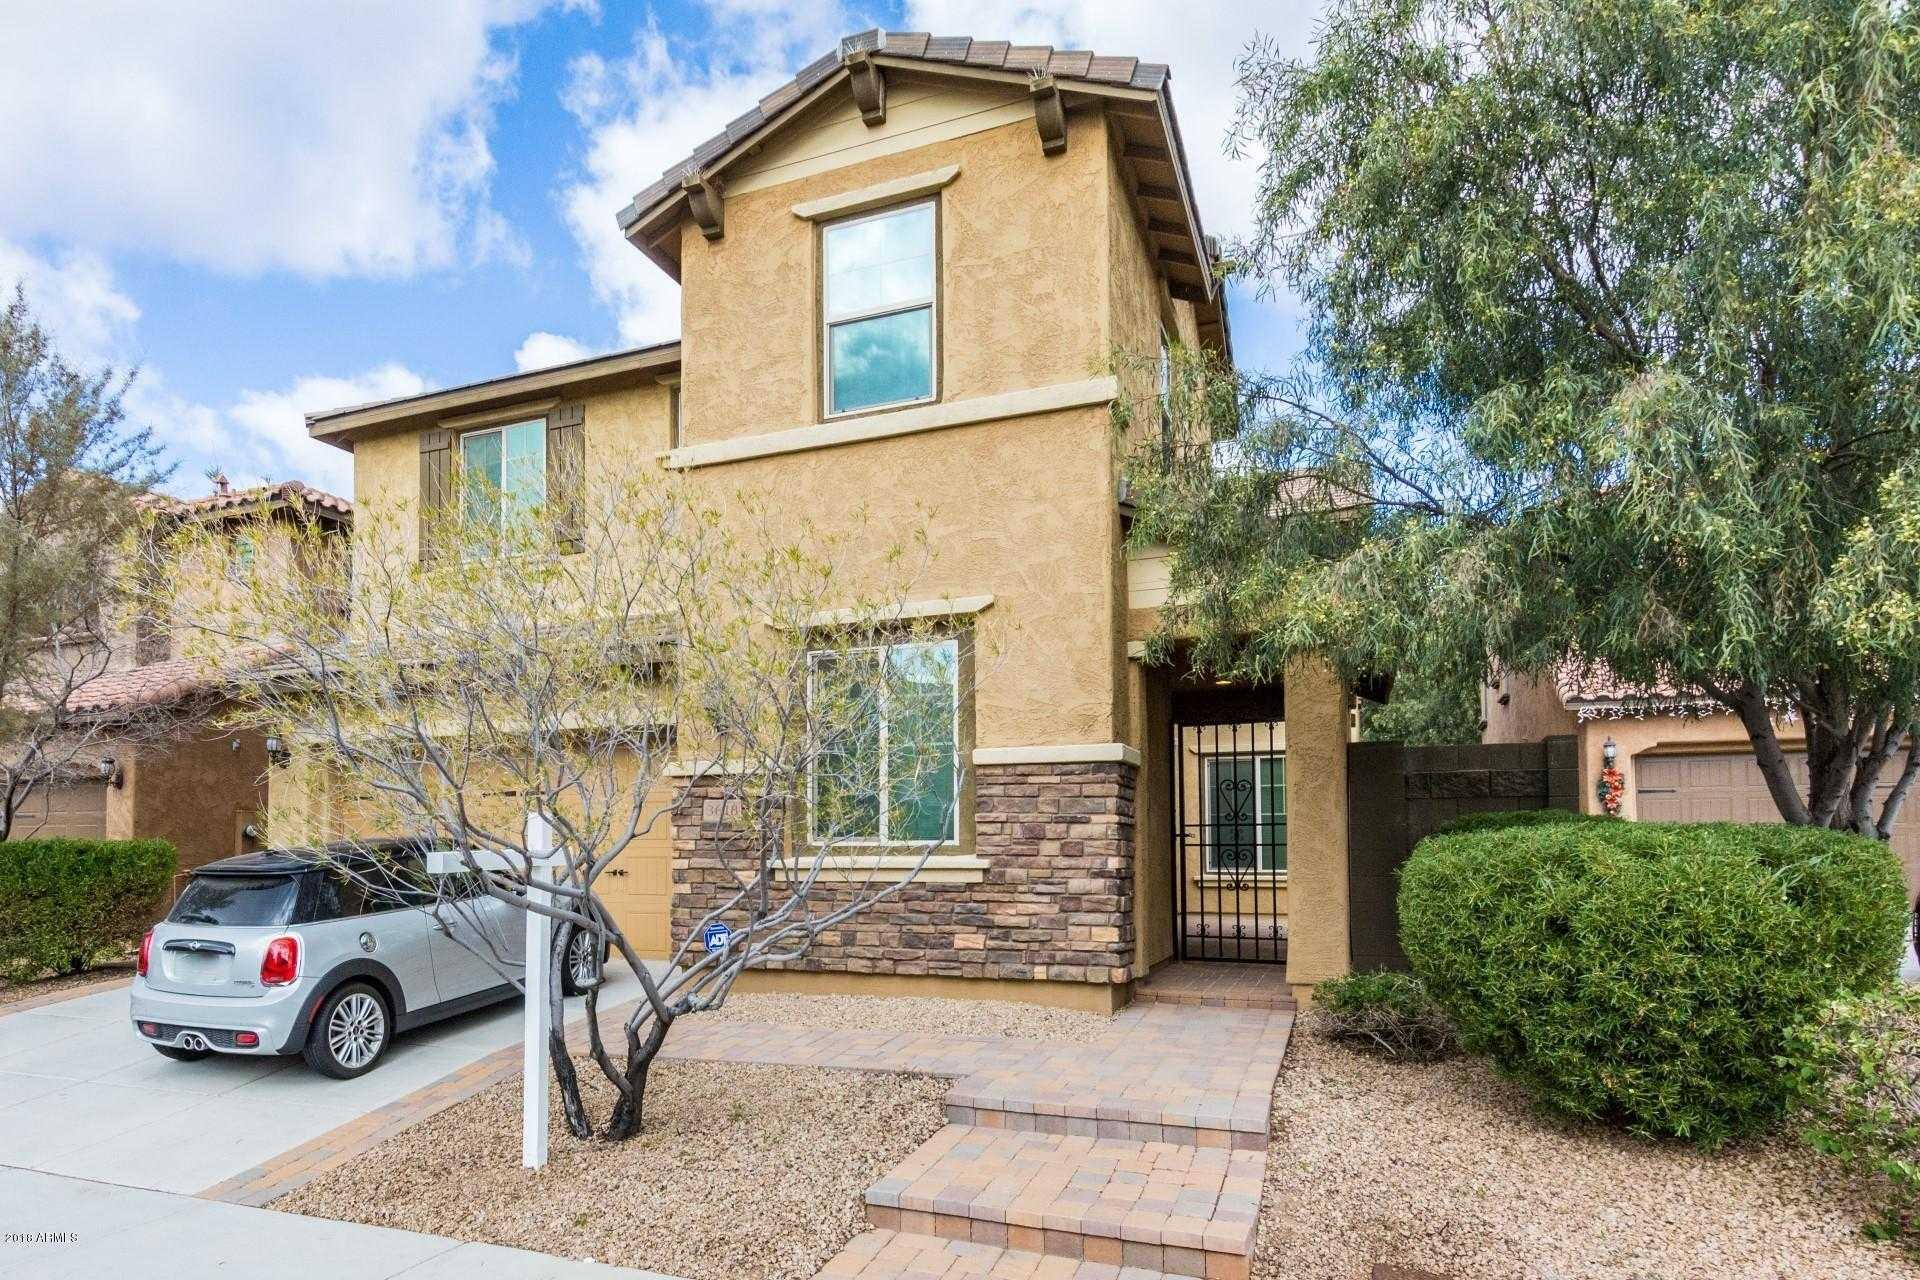 $585,000 - 5Br/5Ba - Home for Sale in Desert Ridge Superblock 11 Parcel 5, Phoenix